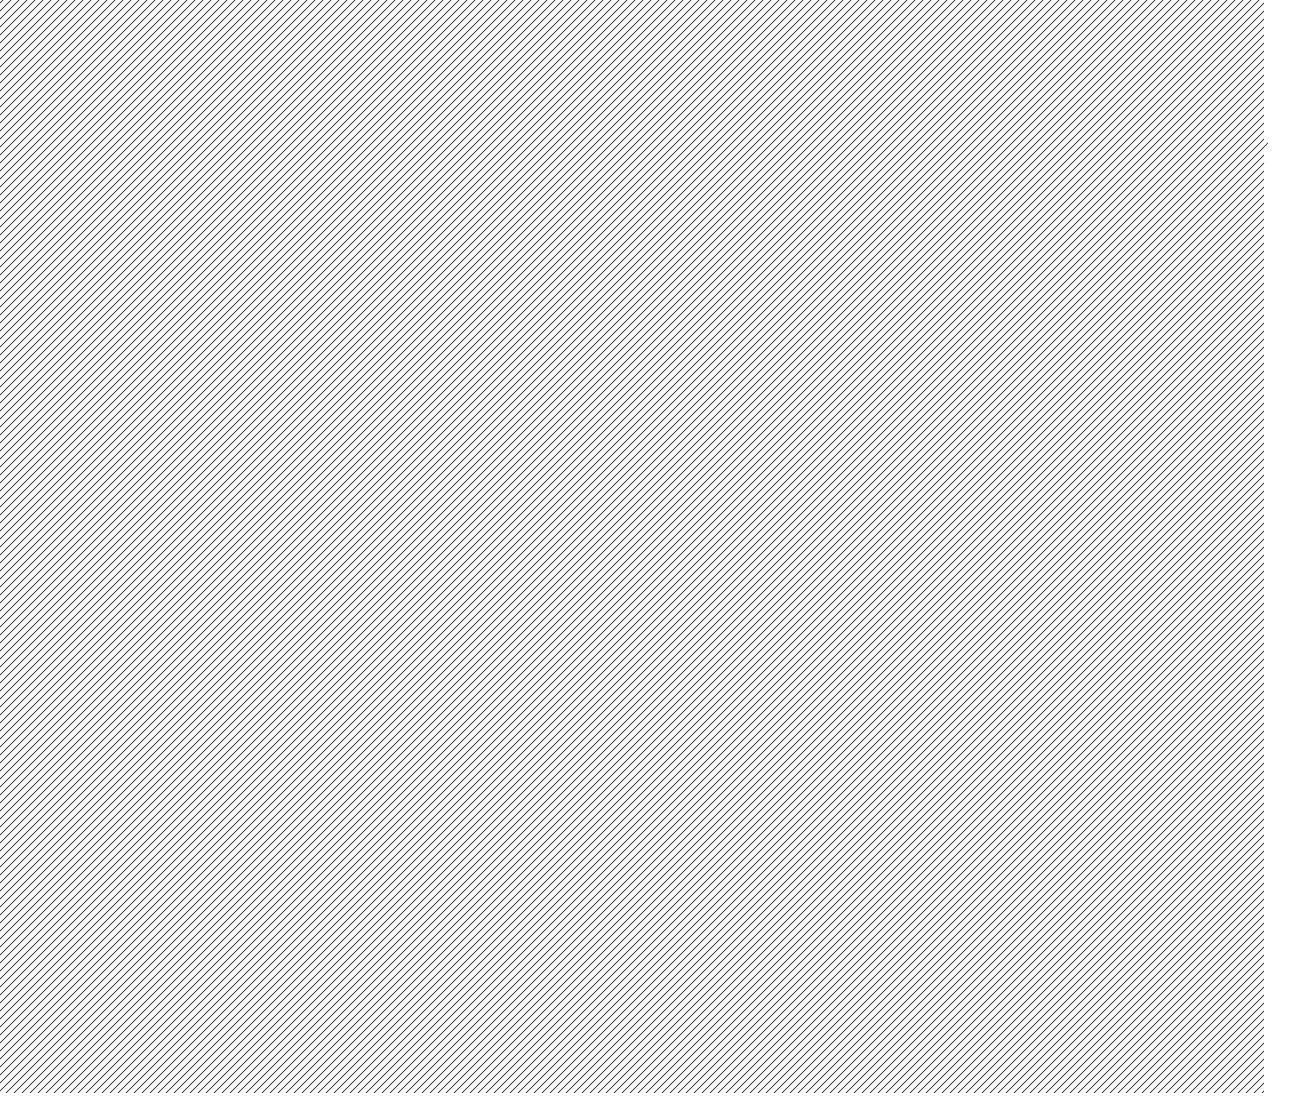 EMBA OL Map